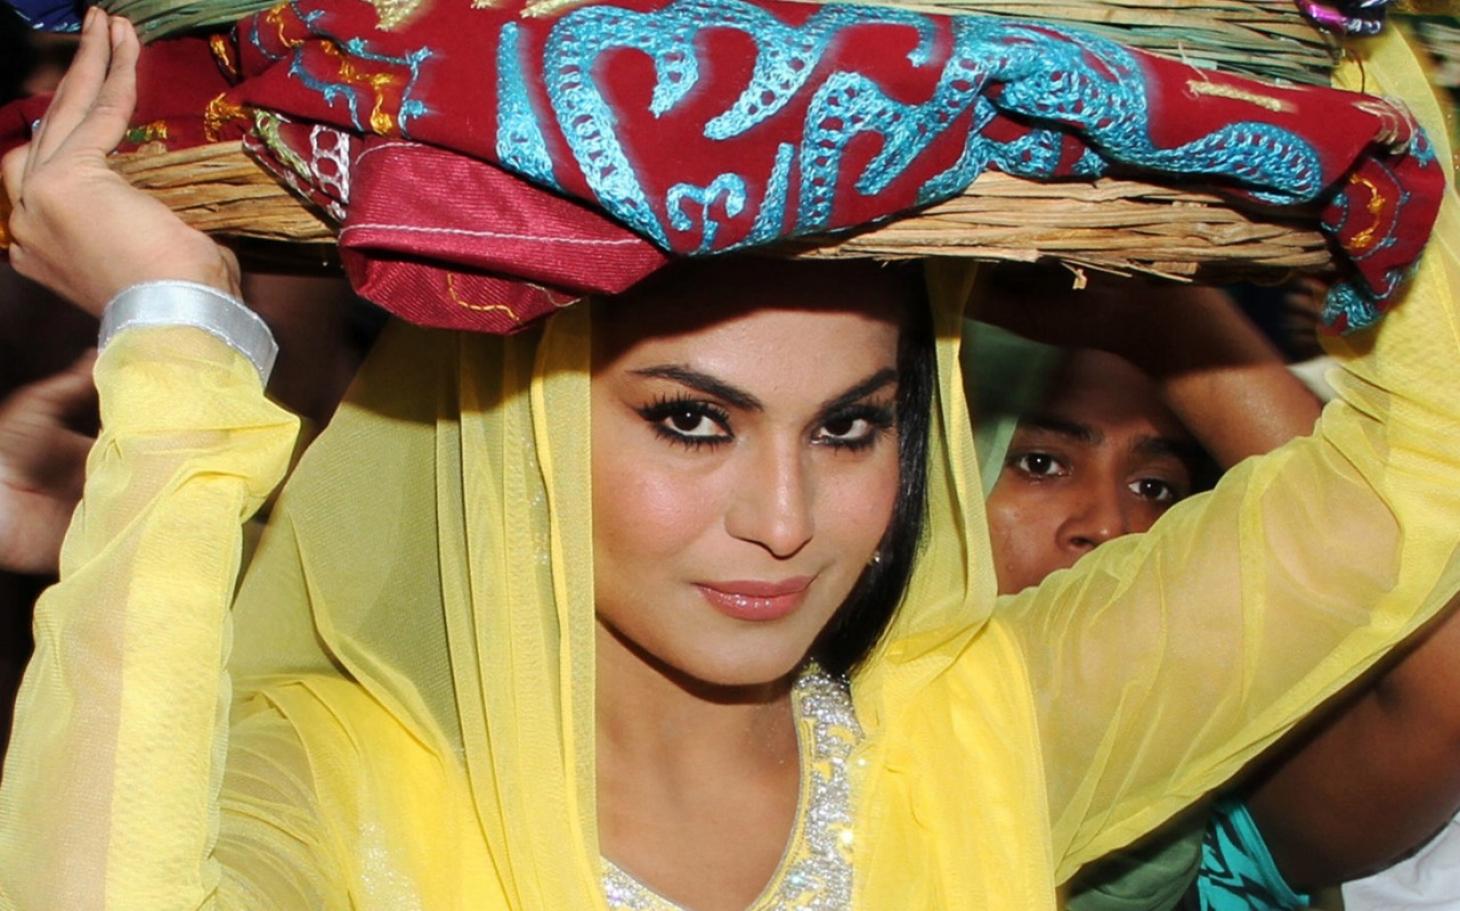 Pakistan's blasphemy law strikes Bollywood | Al Jazeera ...